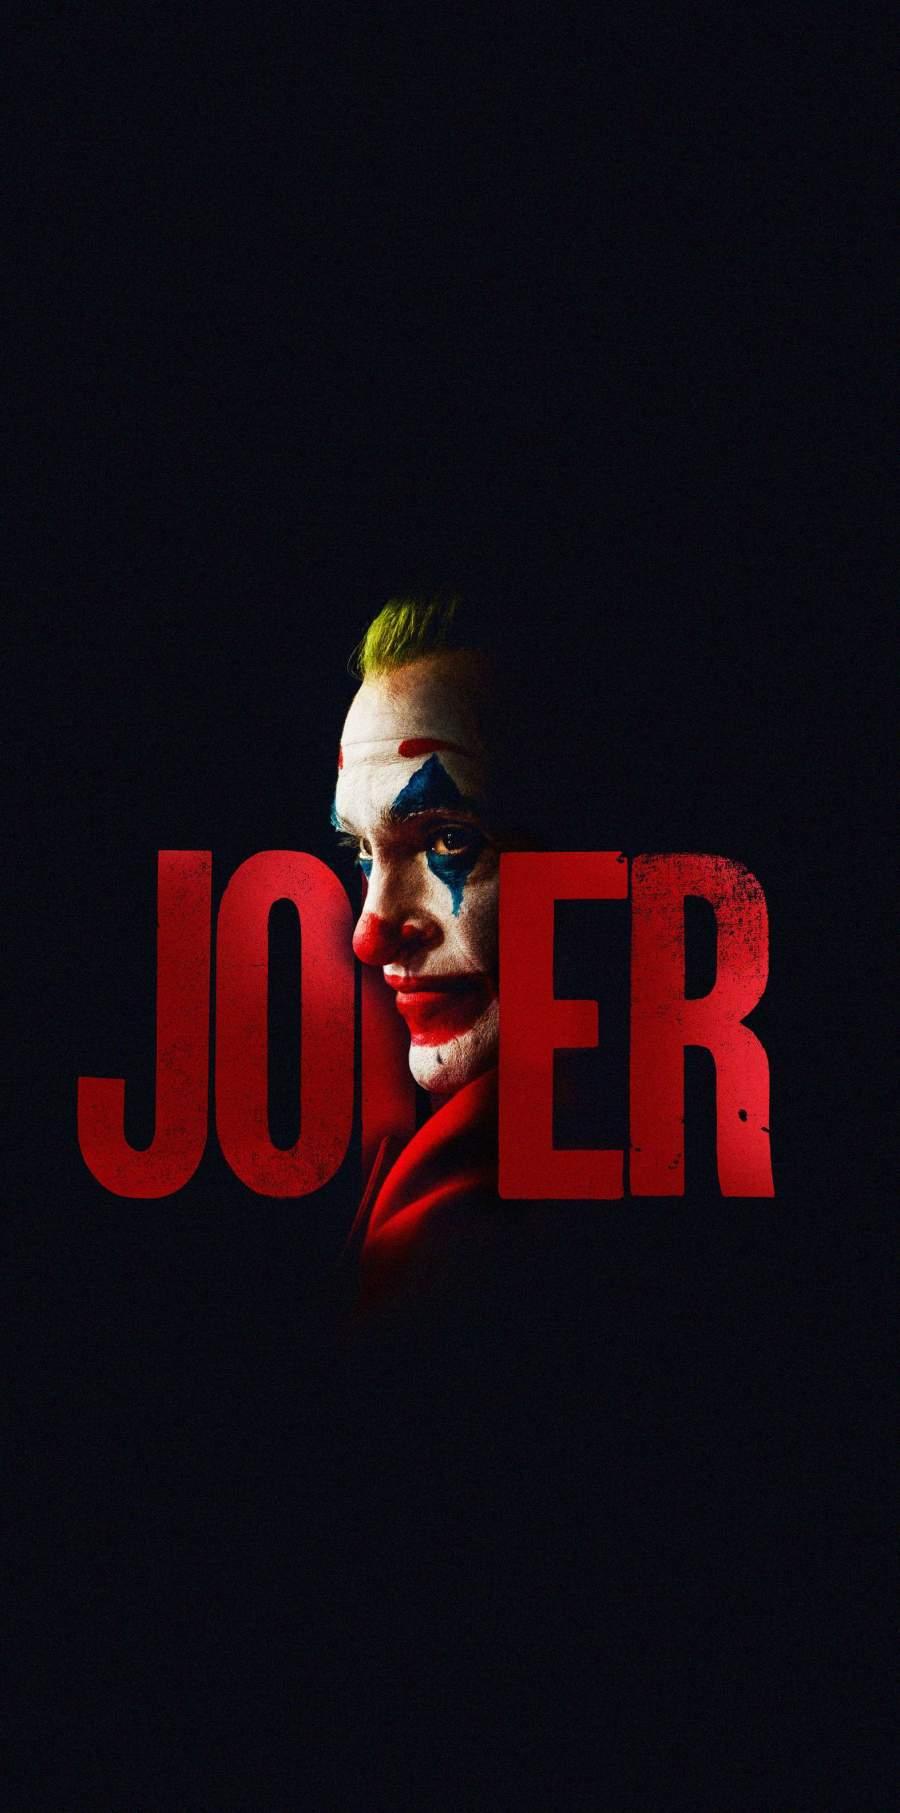 Joker iPhone Wallpaper 1